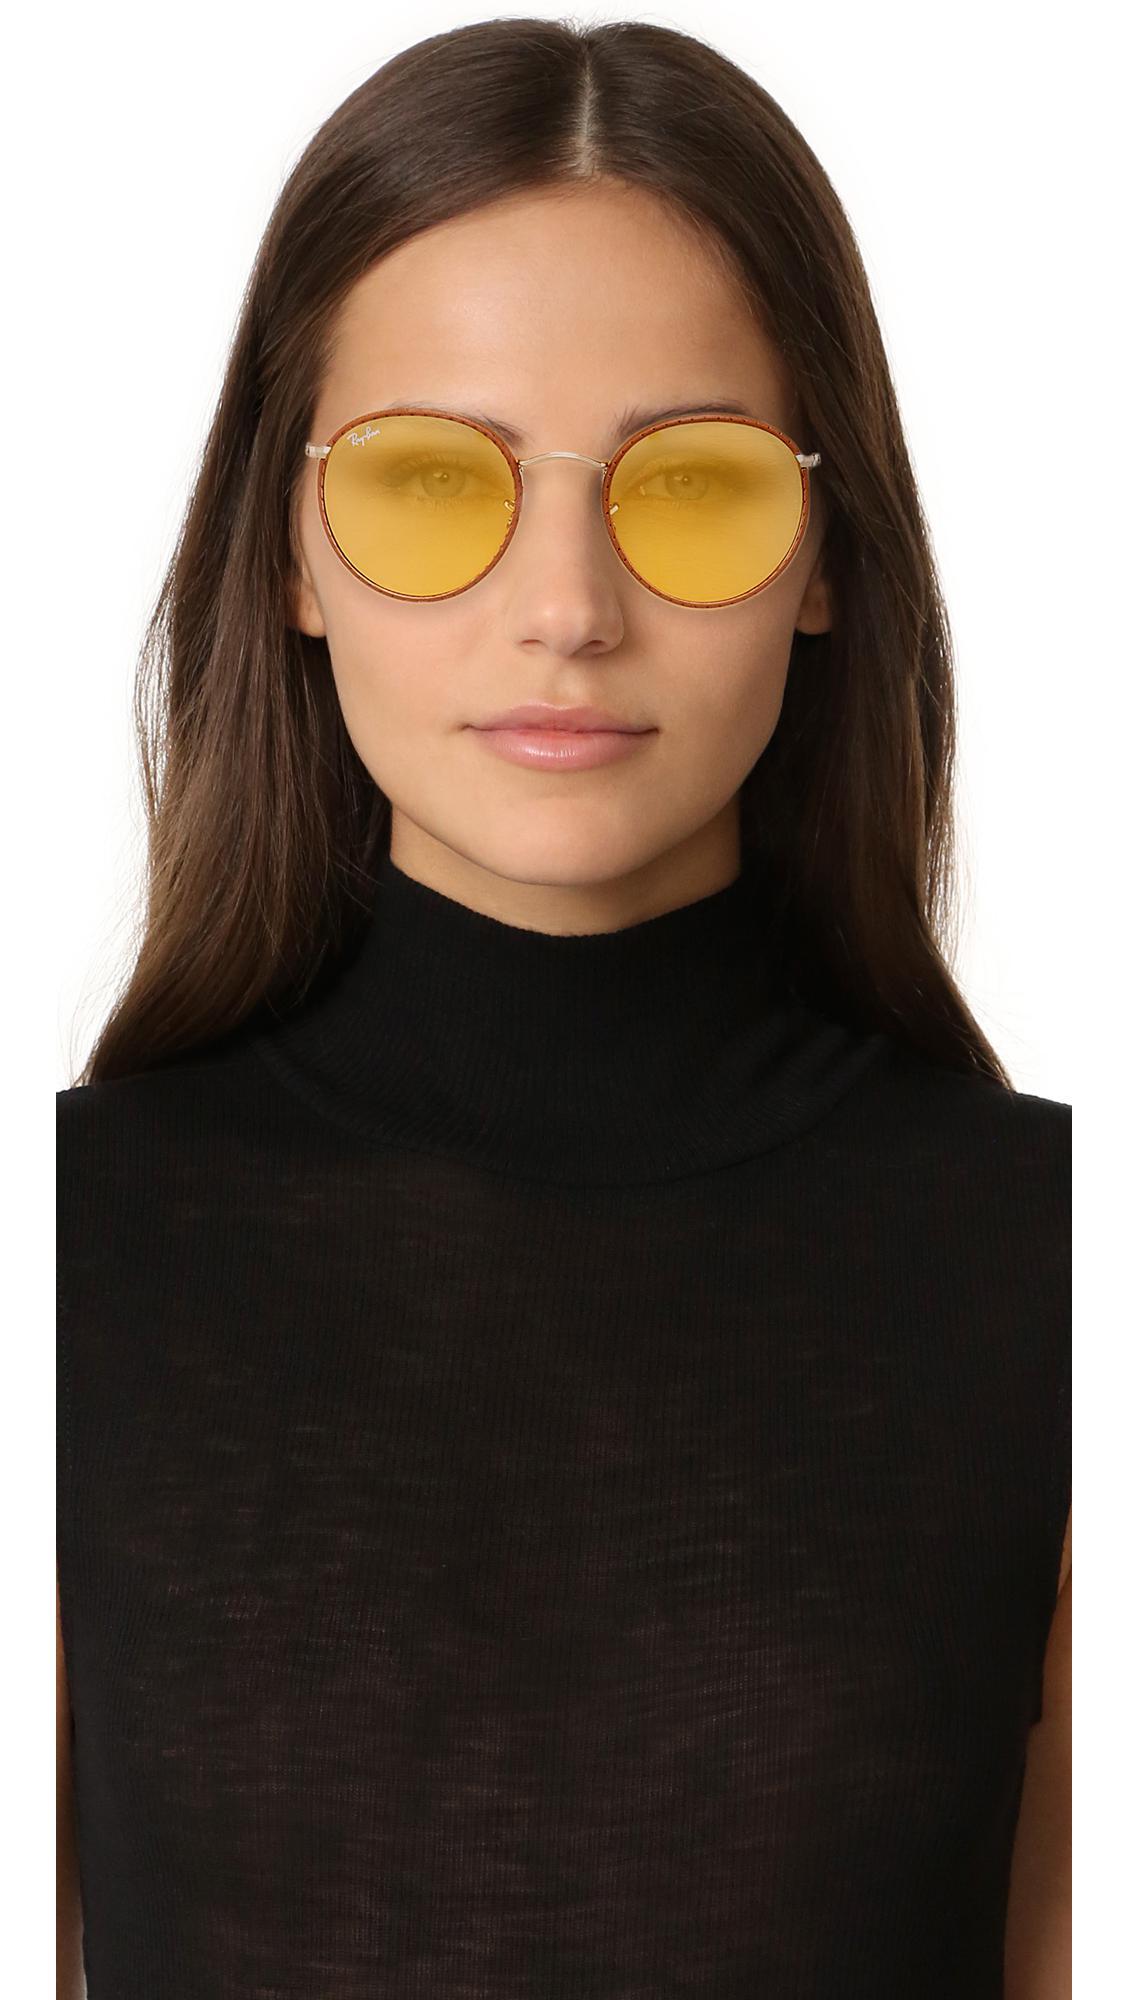 cedb6ec842 Lyst - Ray-Ban Phantos Round Leather Photochromic Sunglasses in Brown